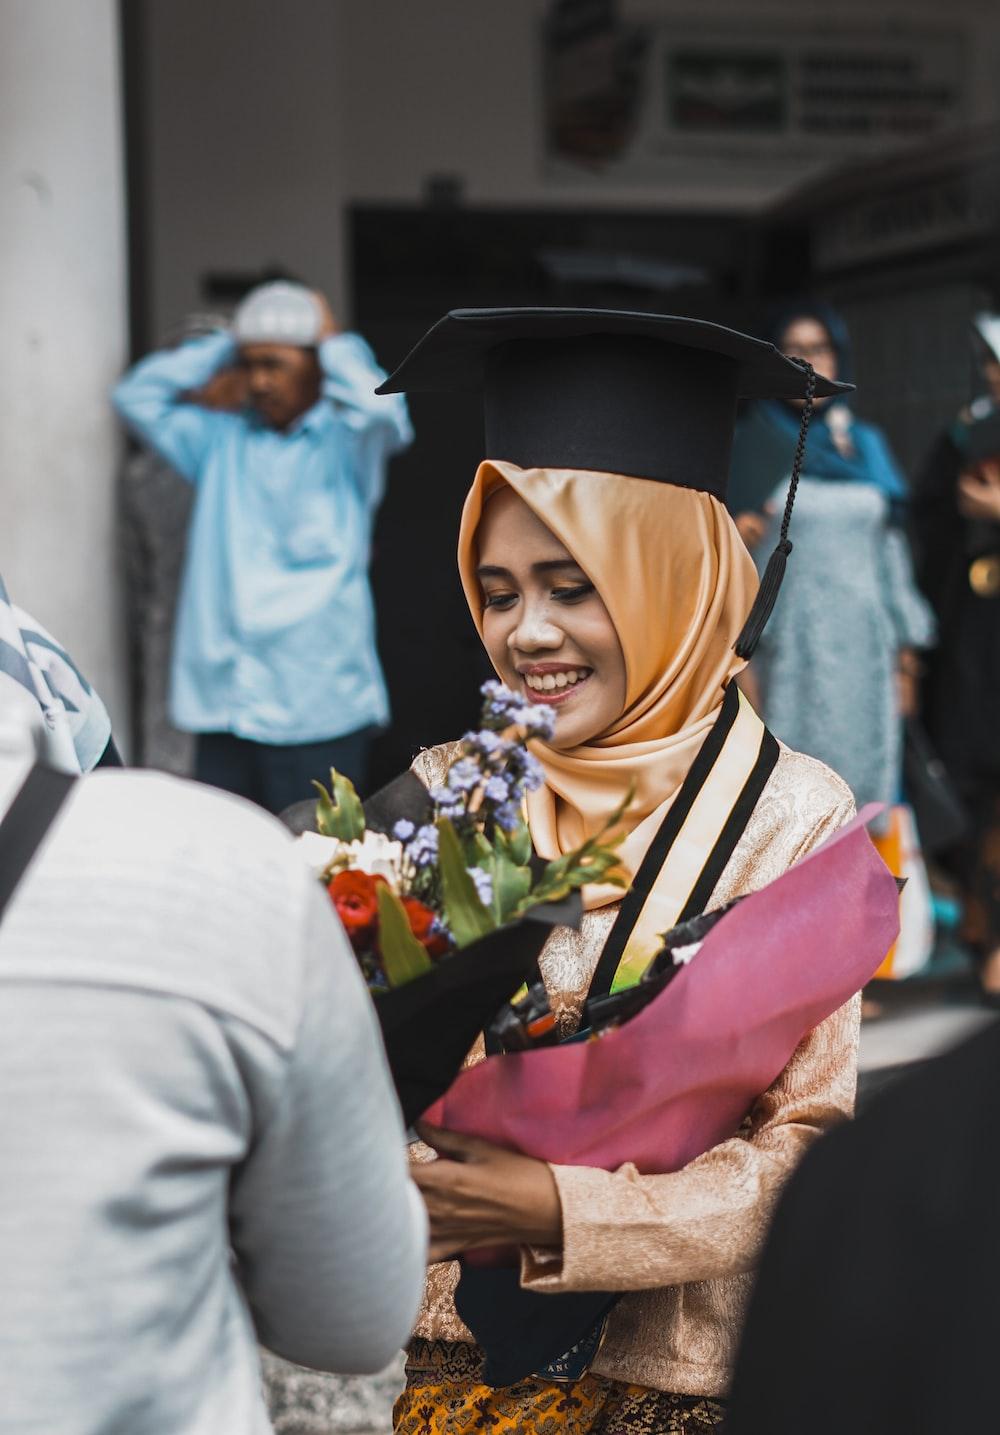 woman receiving bouquet of flowers